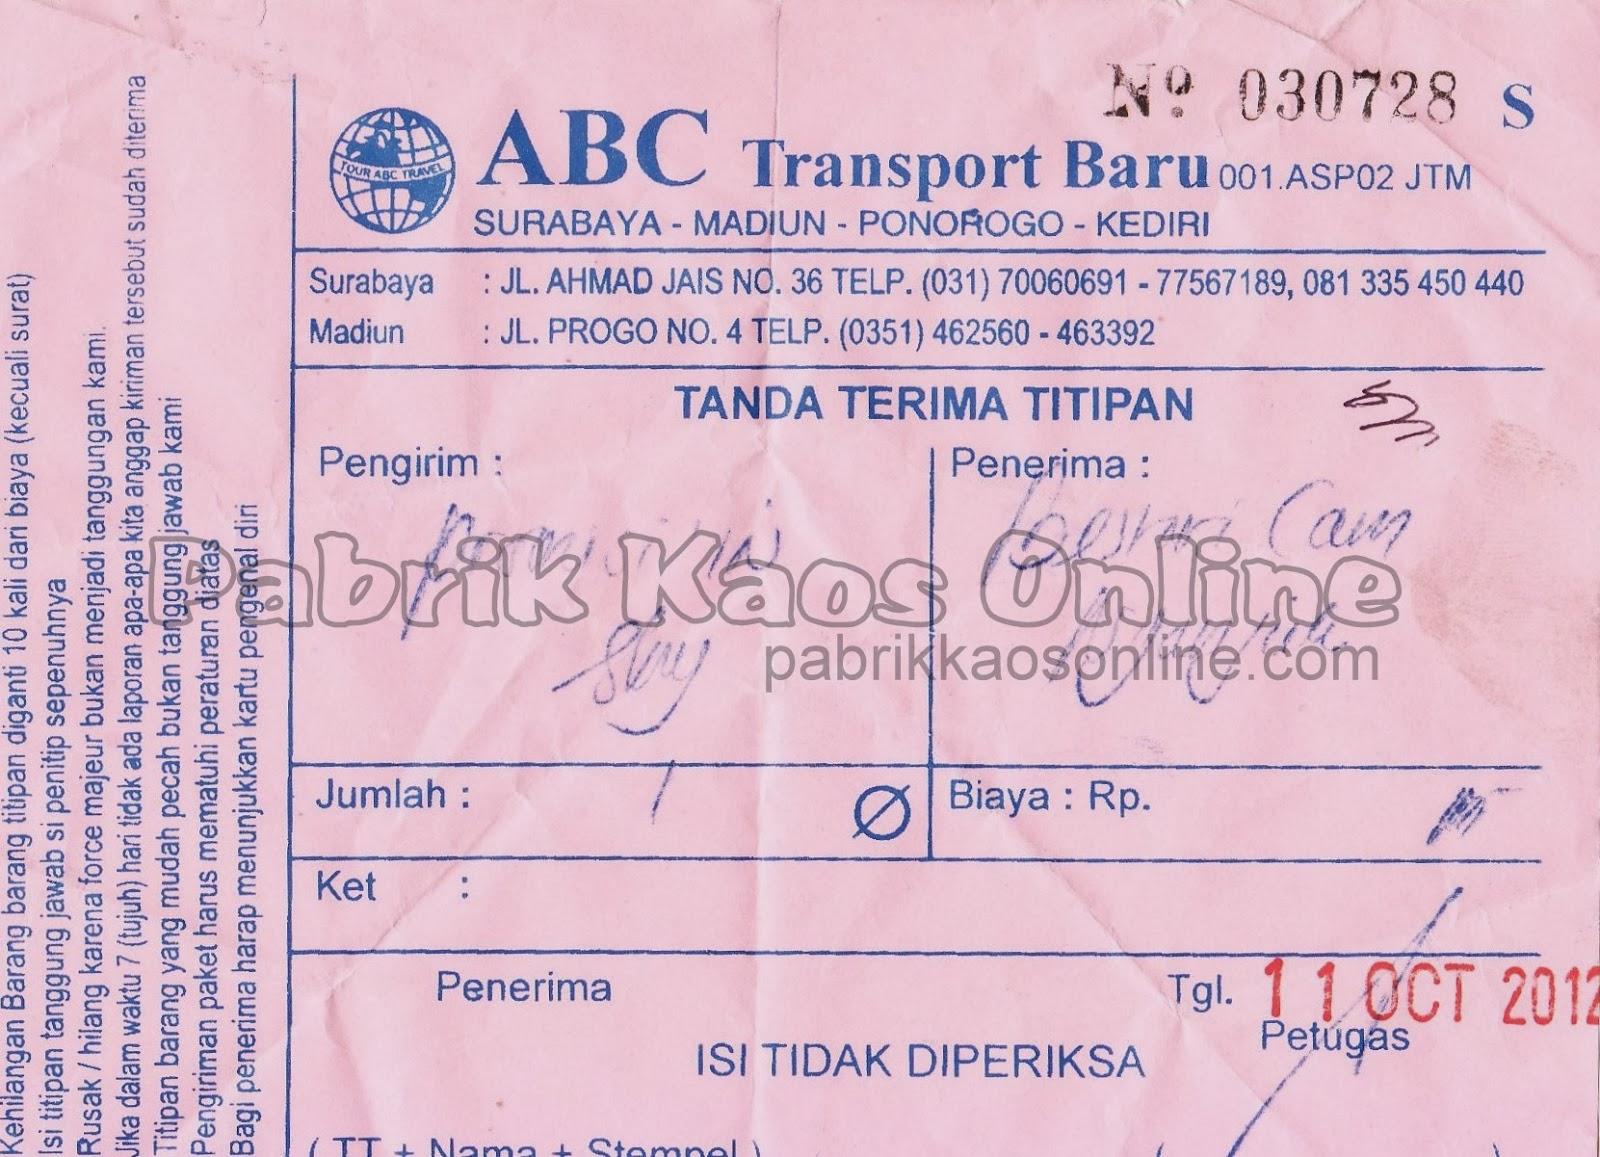 nota kirim nganjuk via ABC Transport baru